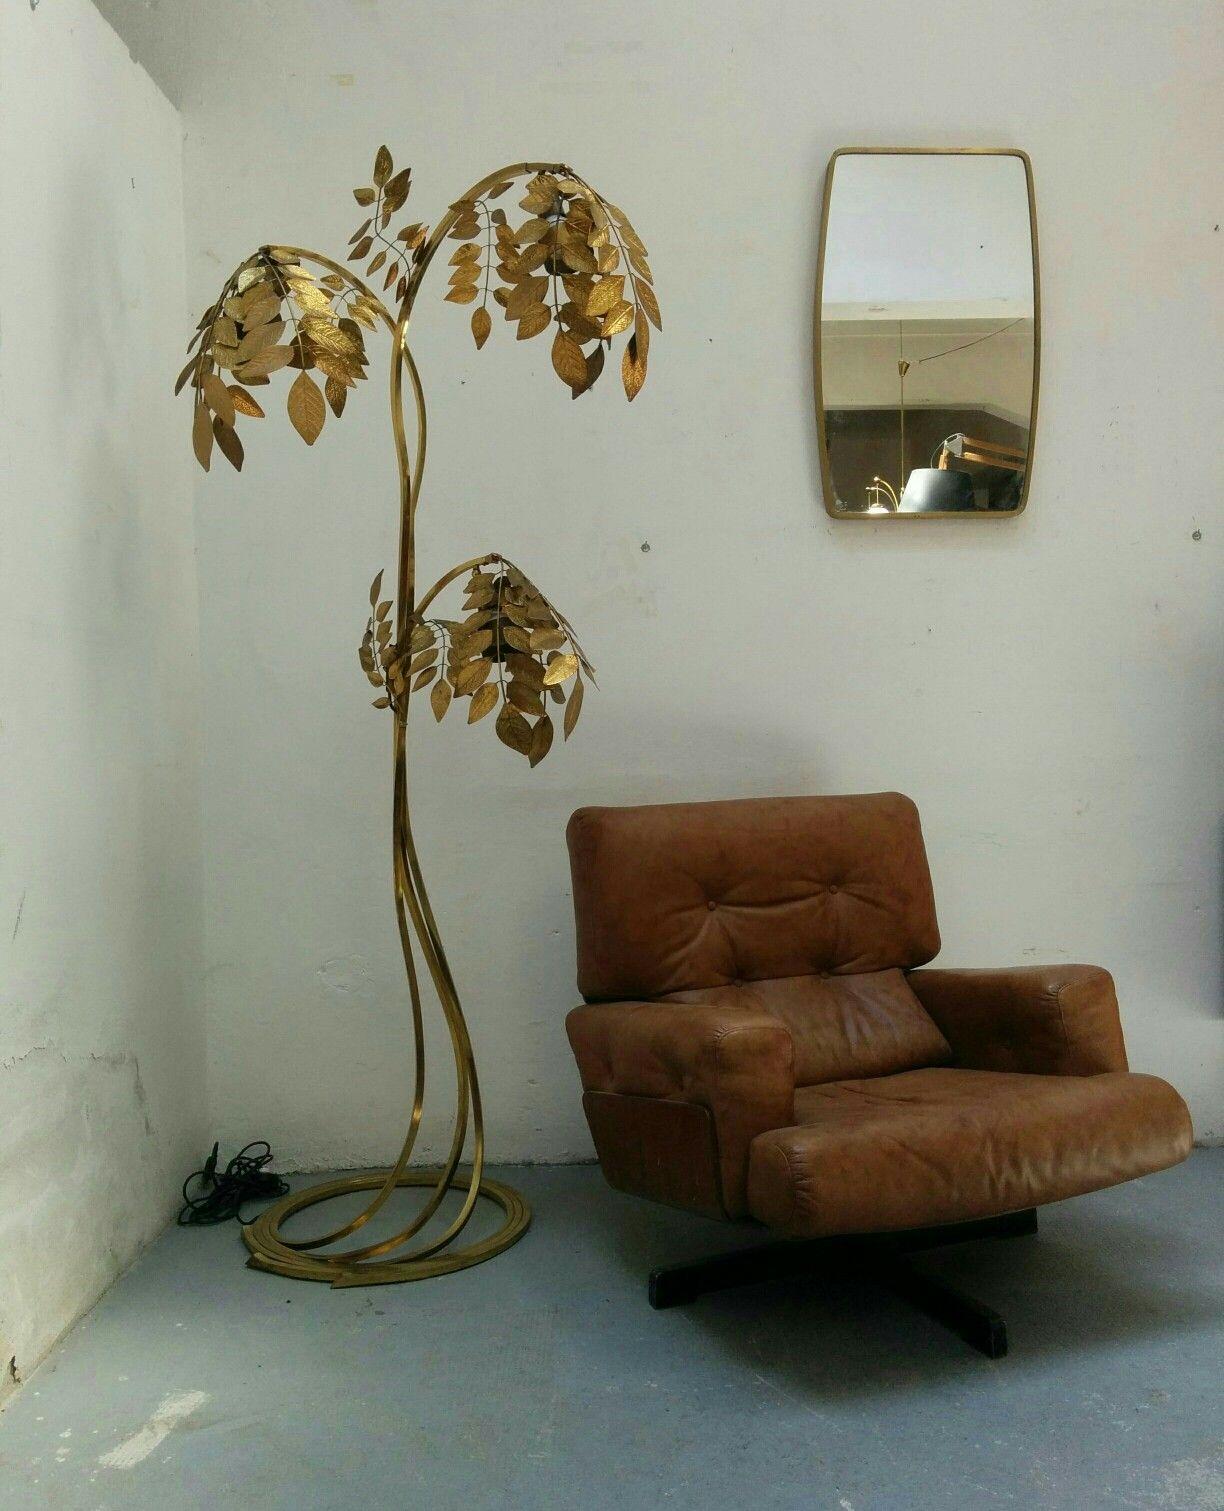 Lampada da terra Tommaso Barbi anni '70'80.Misure 95x